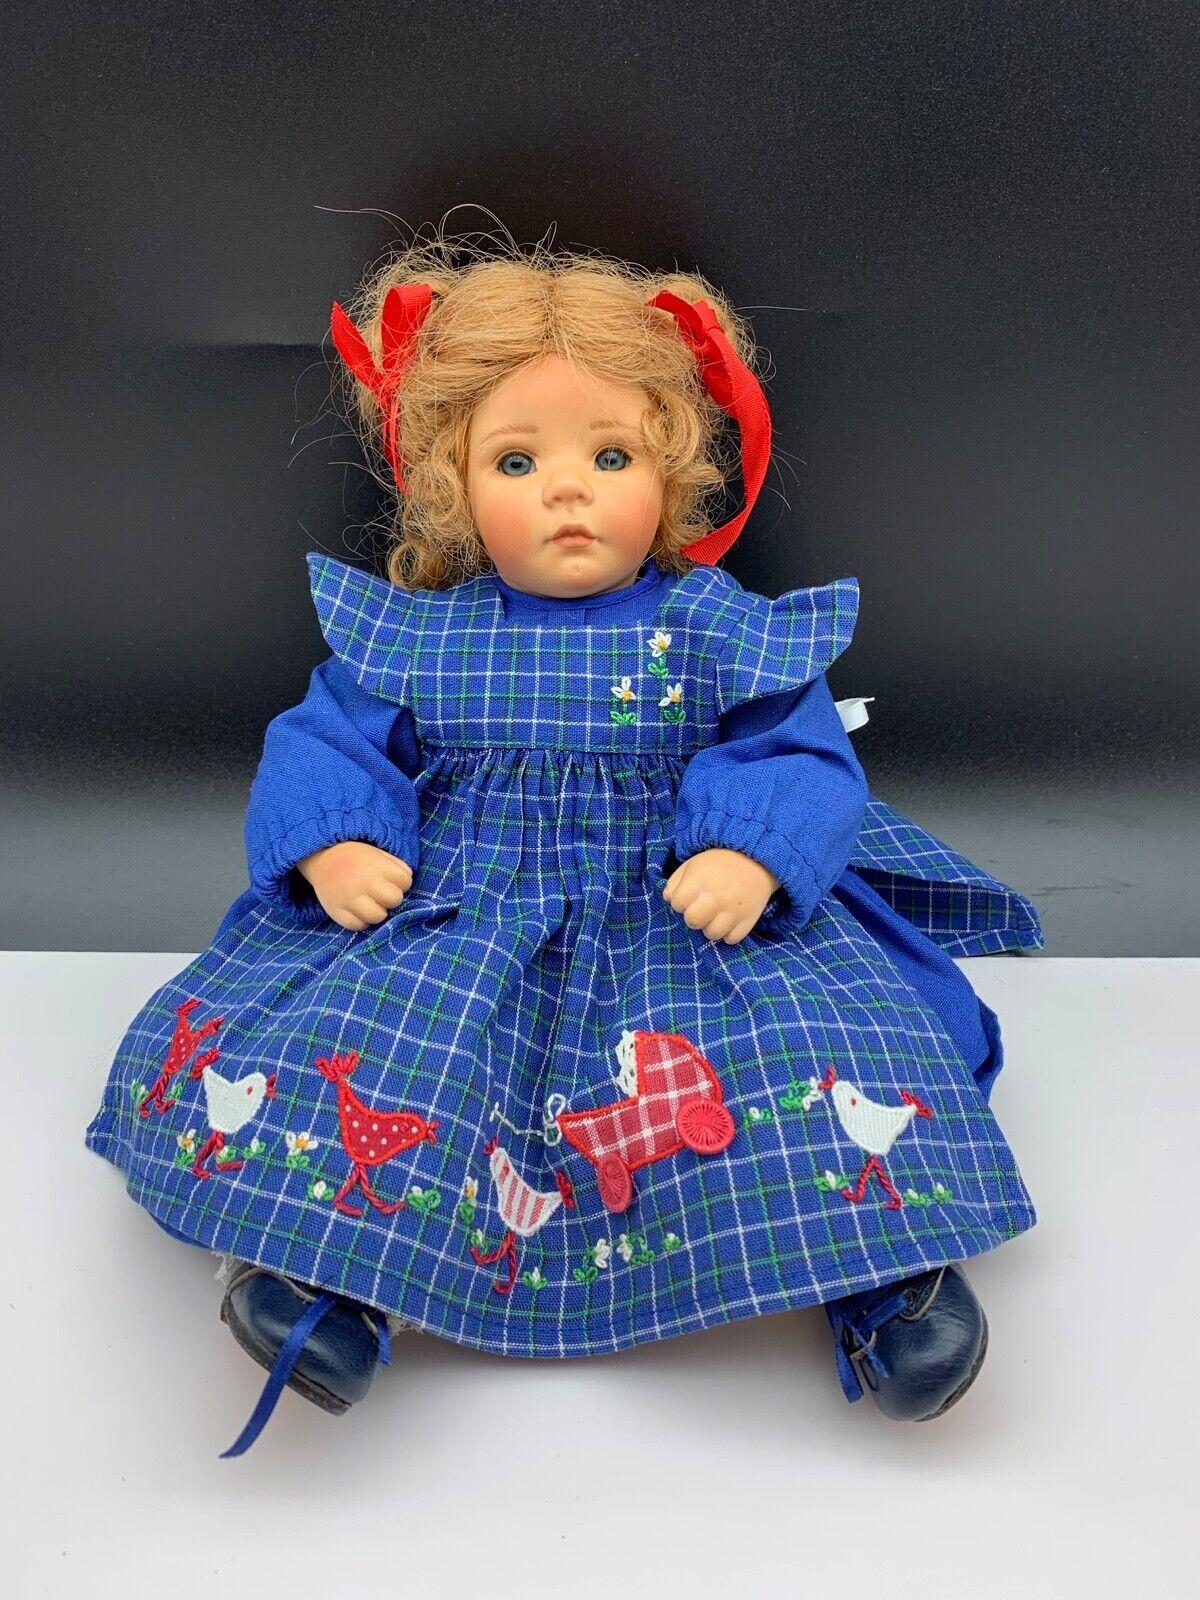 Top Zustand Various Styles Dolls & Bears Zapf Künstlerpuppe Vinyl Puppe 50 Cm Dolls